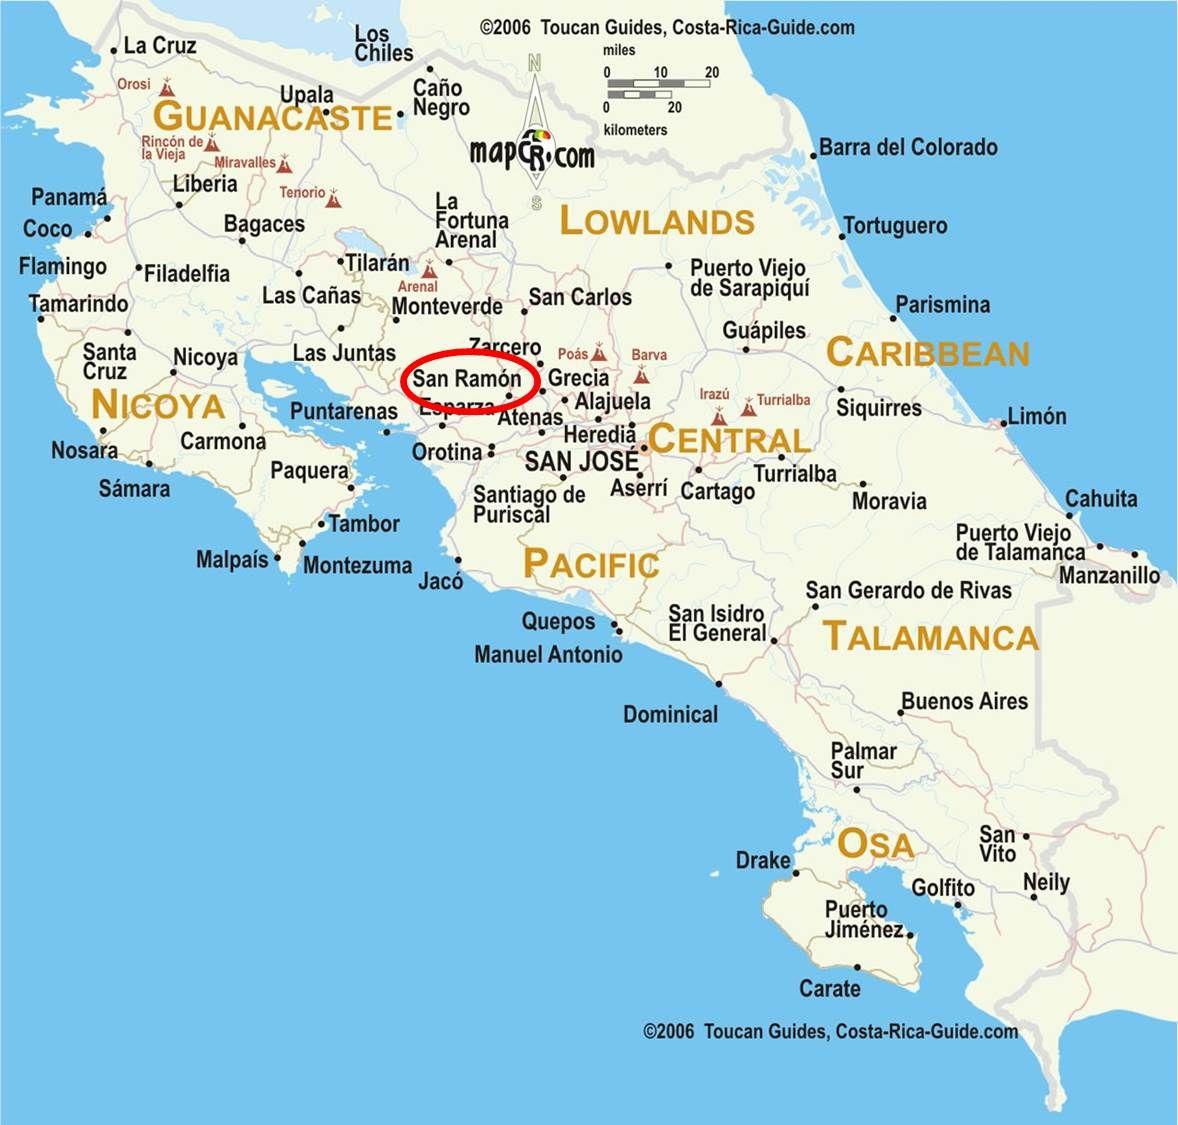 Map of Costa Rica the area around San Ramon is circled ... San Ramon Map on west roseville map, turlock map, south san francisco map, west covina map, san pablo map, port costa map, burlingame map, mission san jose map, santa rosa map, santa cruz costa rica map, tuolumne map, el sobrante map, lafayette map, rockridge map, sacramento map, richgrove map, san pedro map, marin city map, san lorenzo map, el dorado county california map,